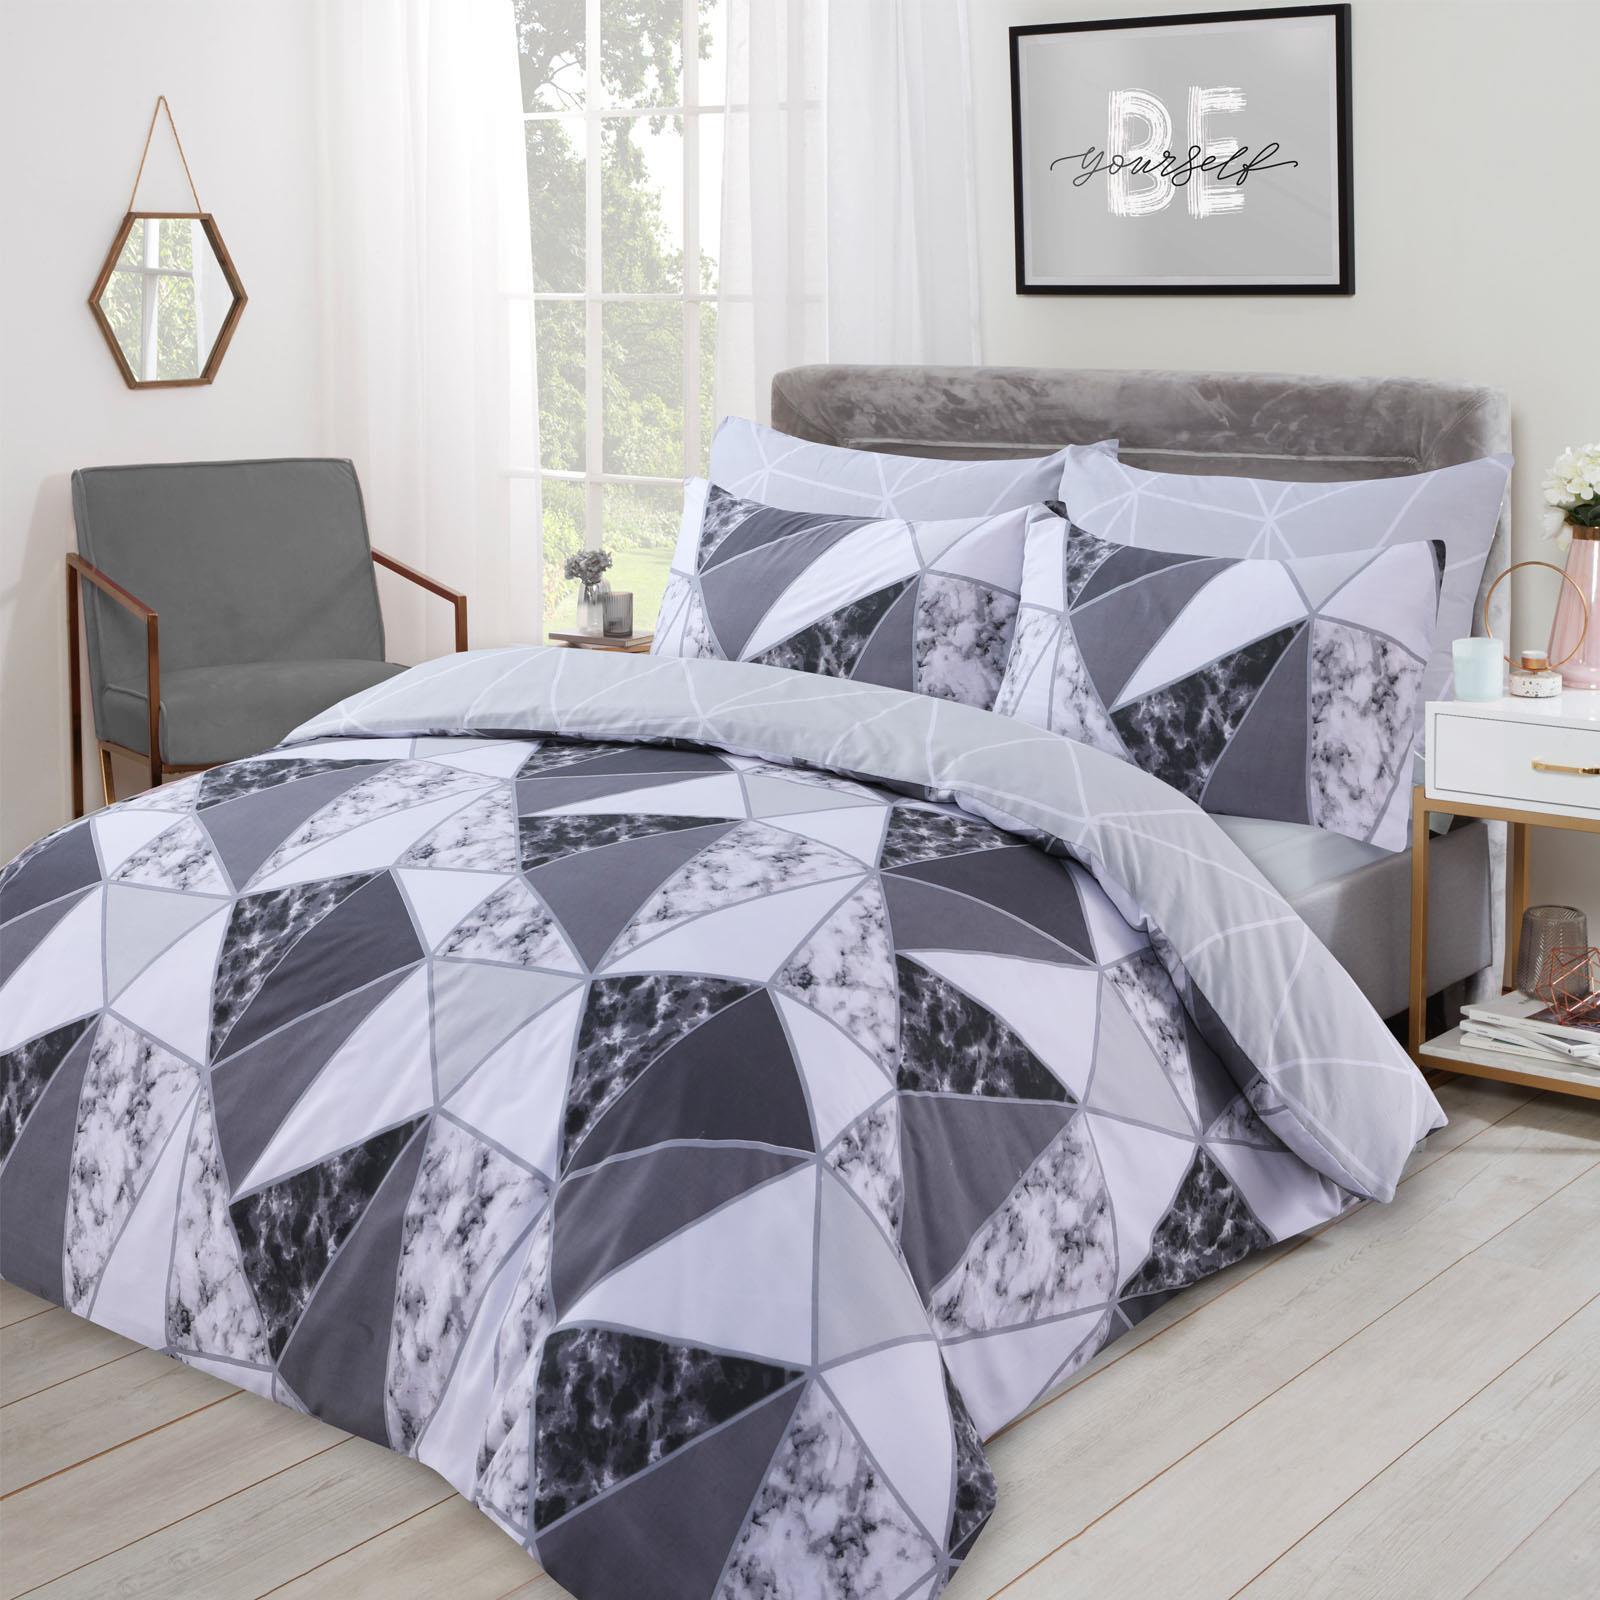 thumbnail 11 - Dreamscene Marble Geometric Duvet Cover with Pillowcase Bedding Set Grey Blush